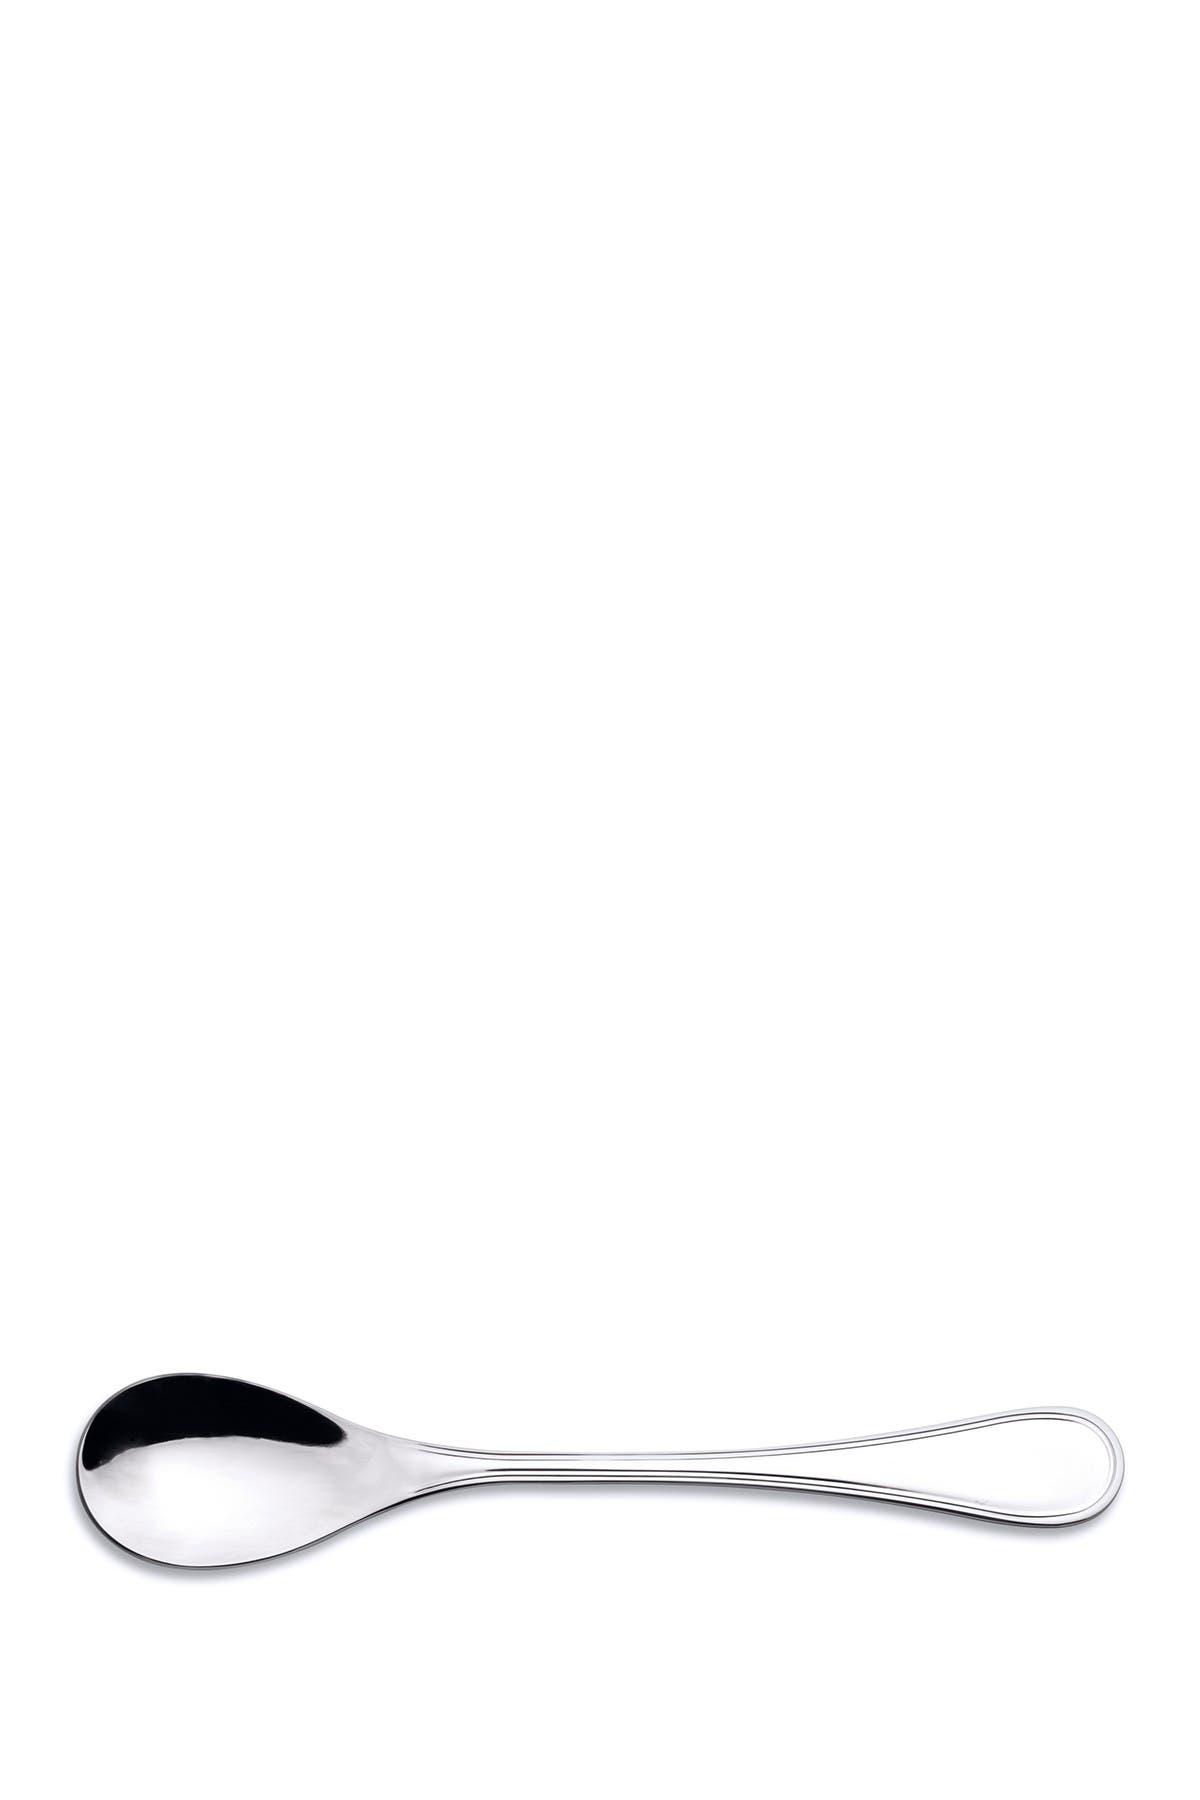 "BergHOFF Cosmos 10.25"" 18/10 Stainless Steel Salad Serving Spoon"